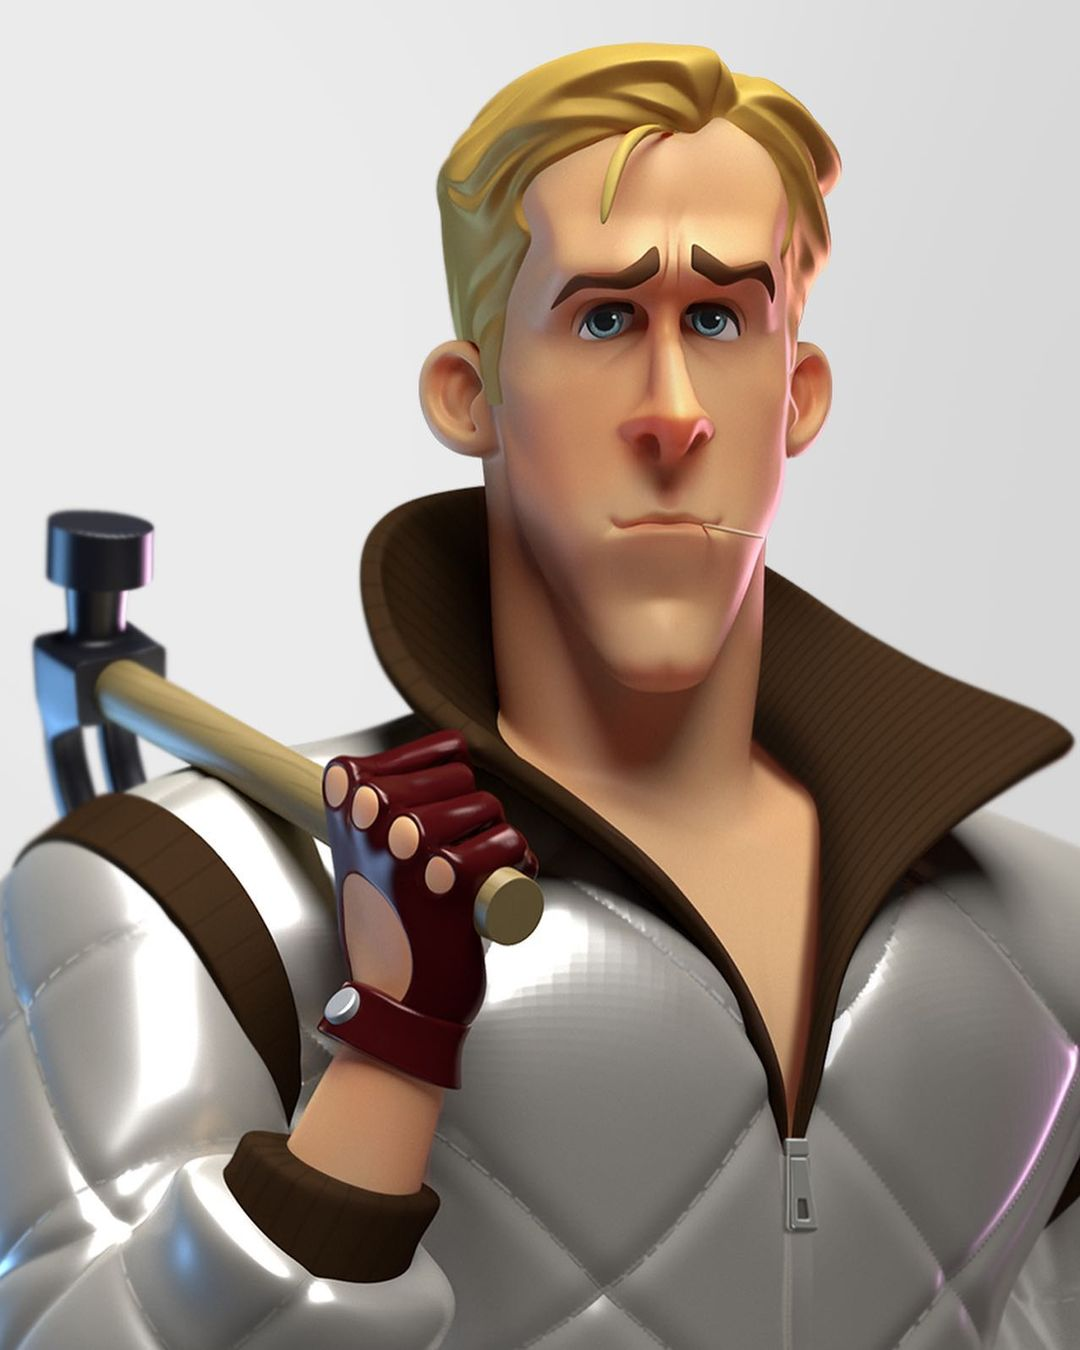 funny 3d model character ryan gosling